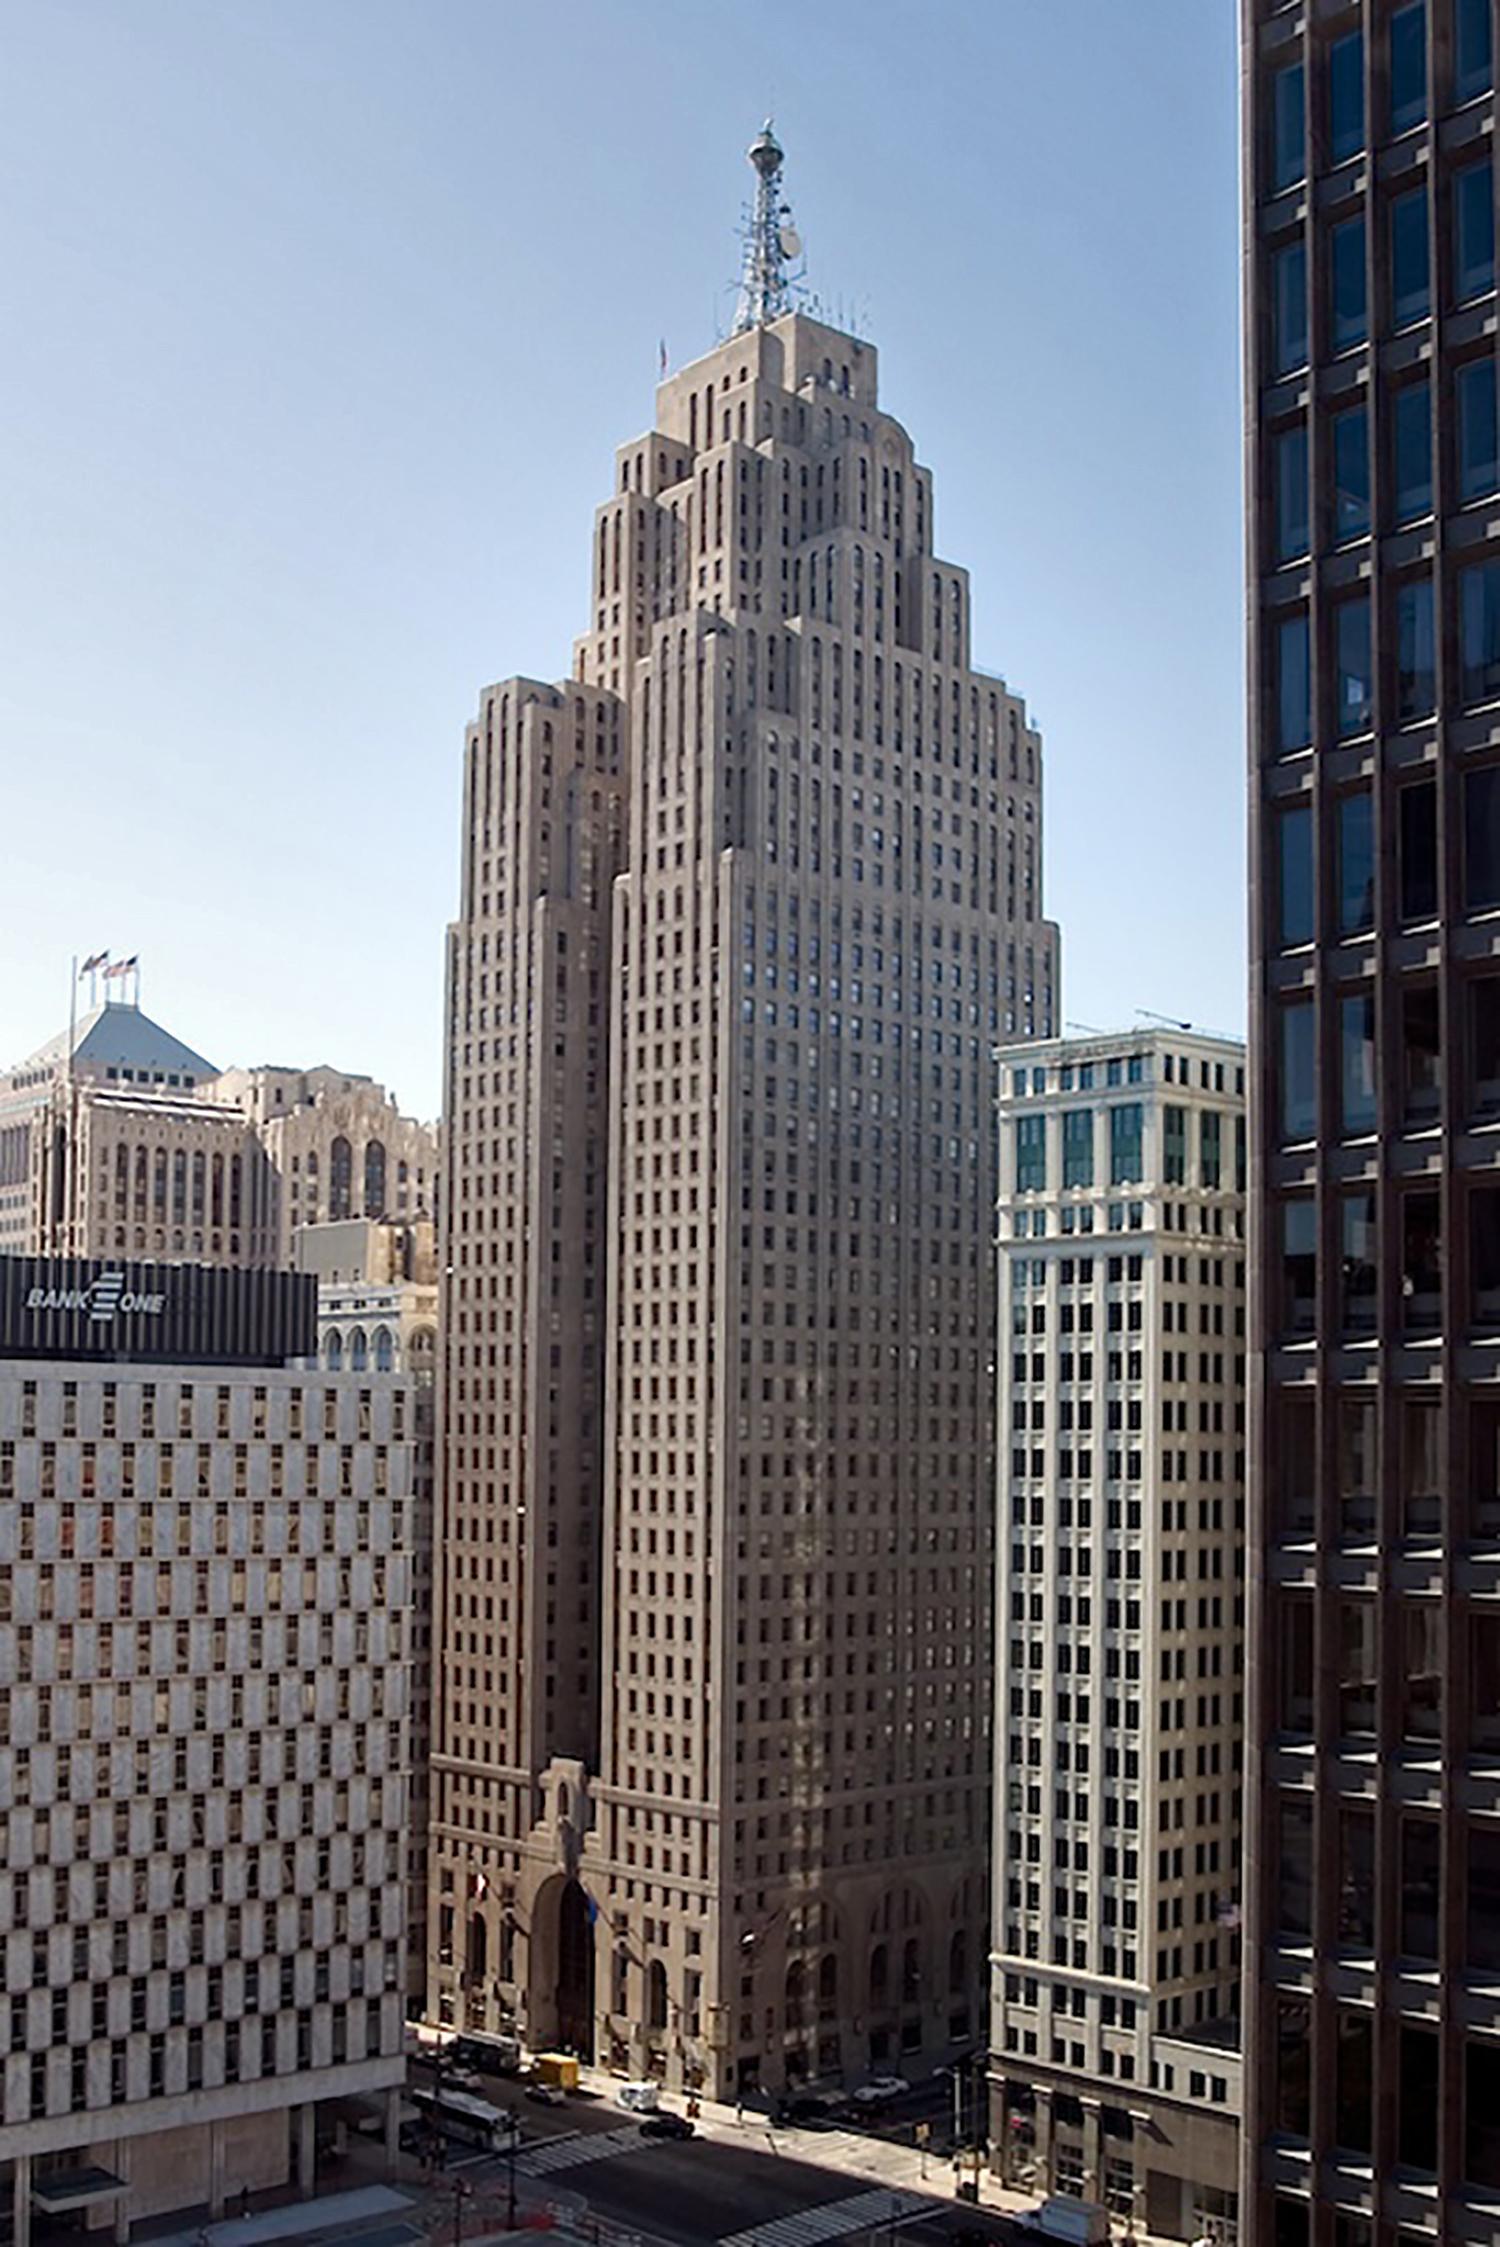 Penobscot Building / Wirt Rowland / 1928